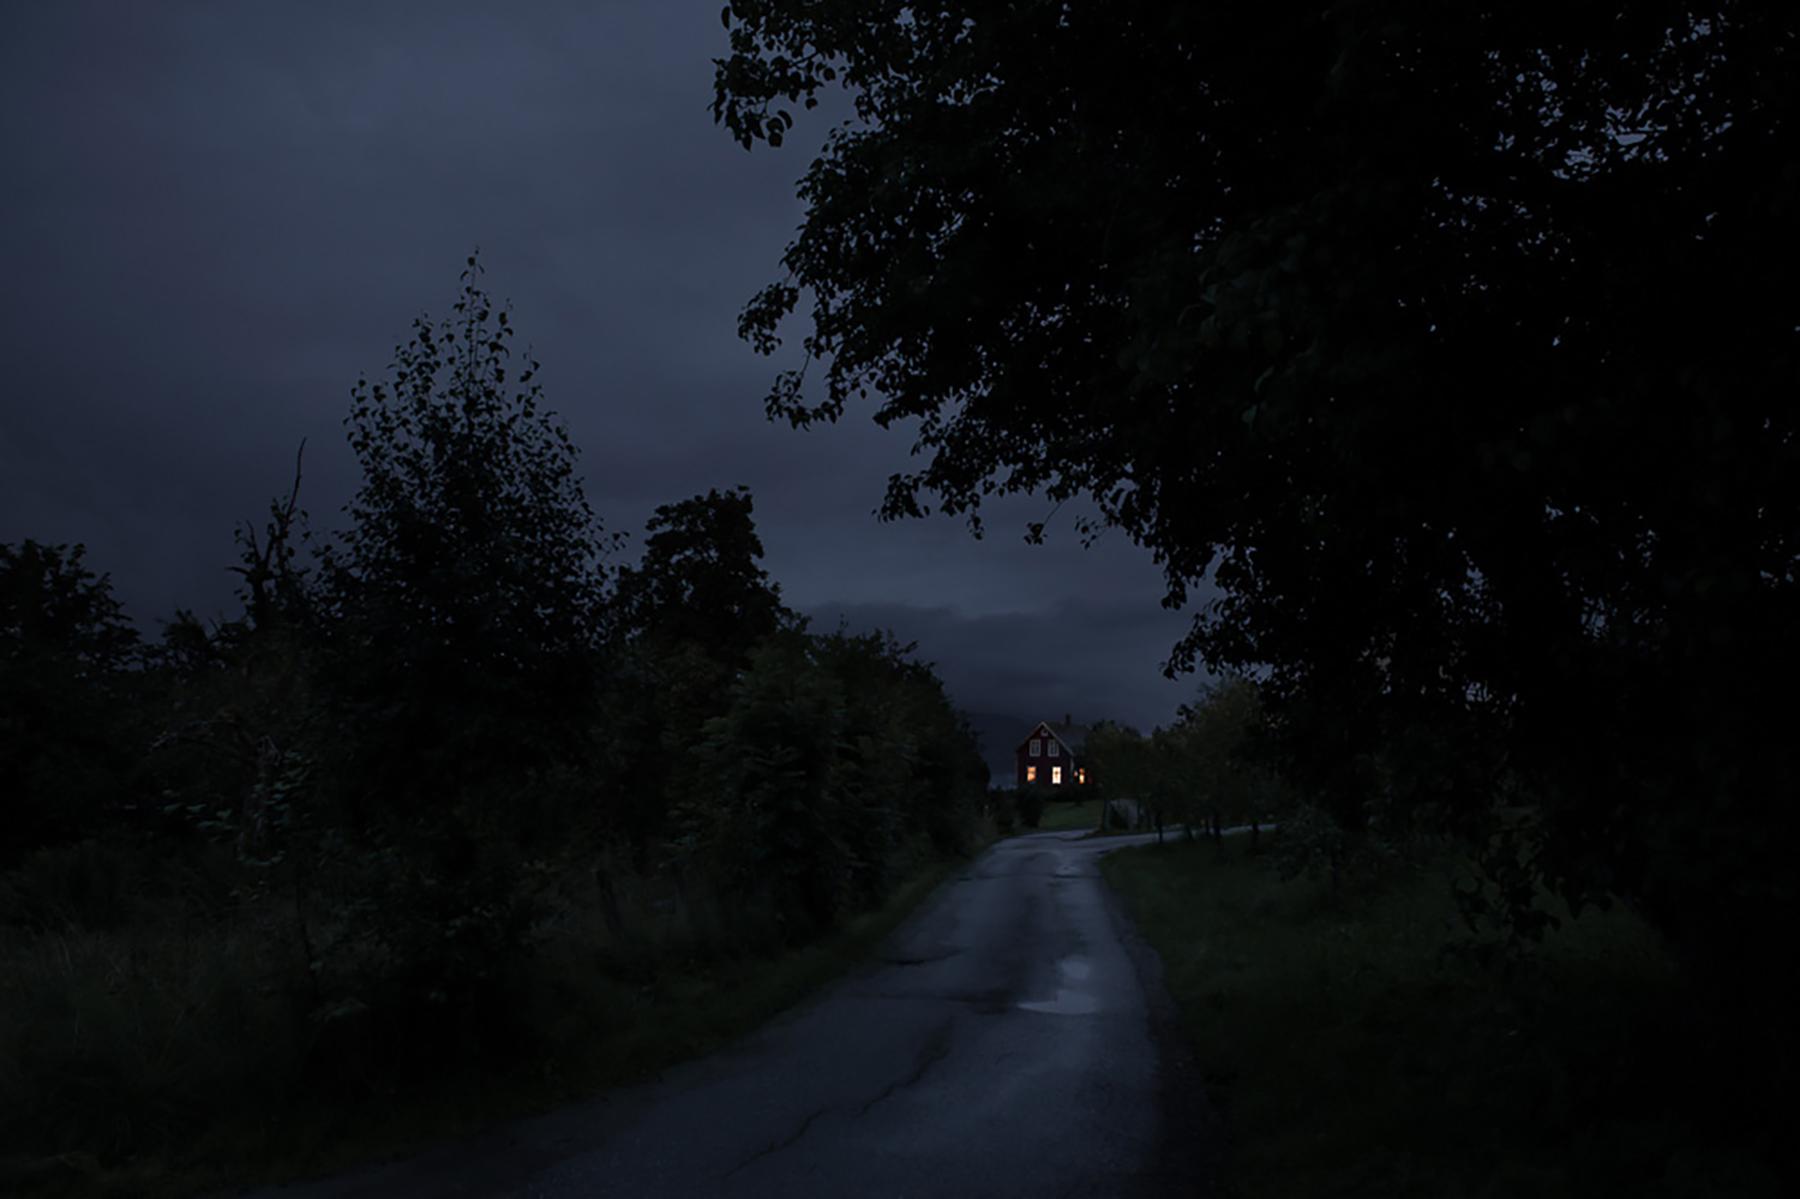 iGNANT-Julien-Mauve-After-Lights-Out-08